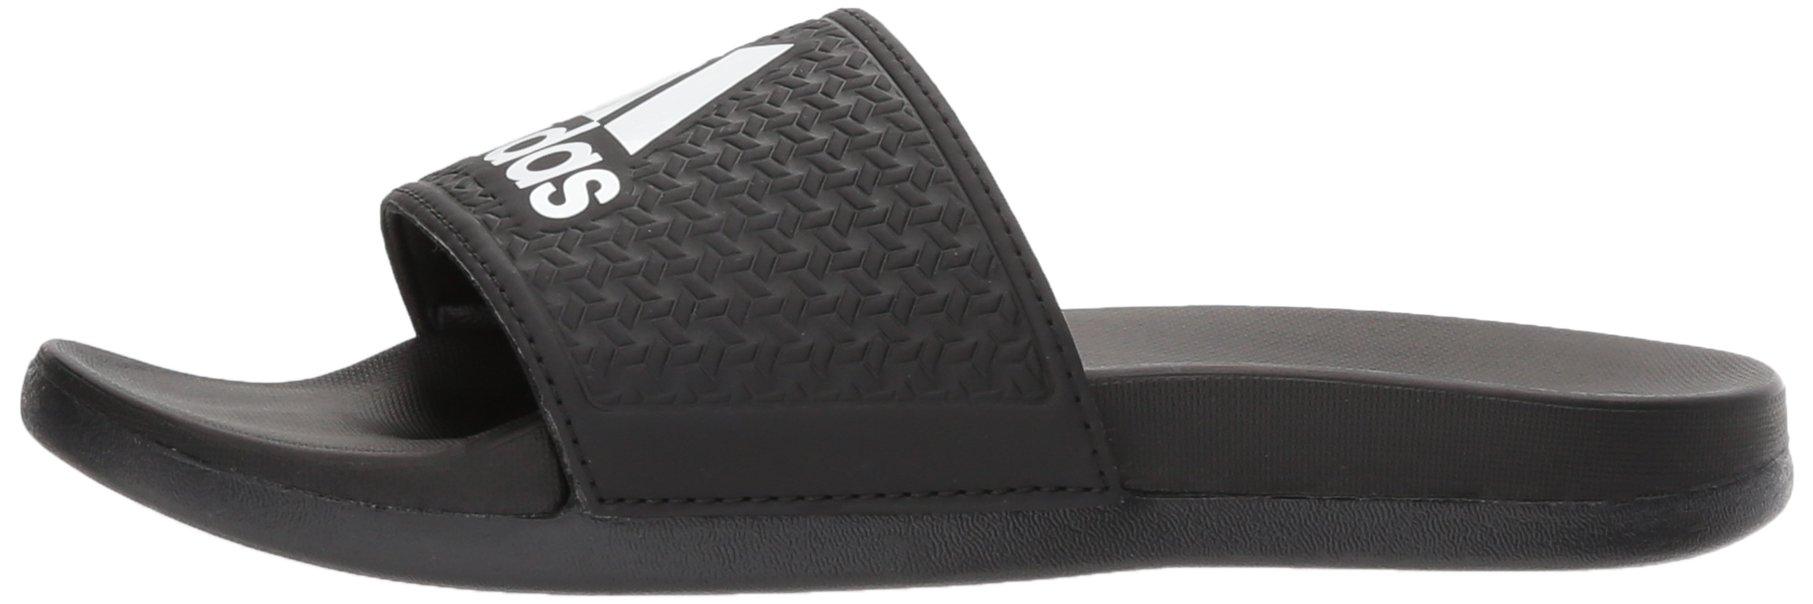 adidas Unisex-Kids Adilette Clf+ K Sandal,core black,White, core black,6 M US Big Kid by adidas (Image #5)